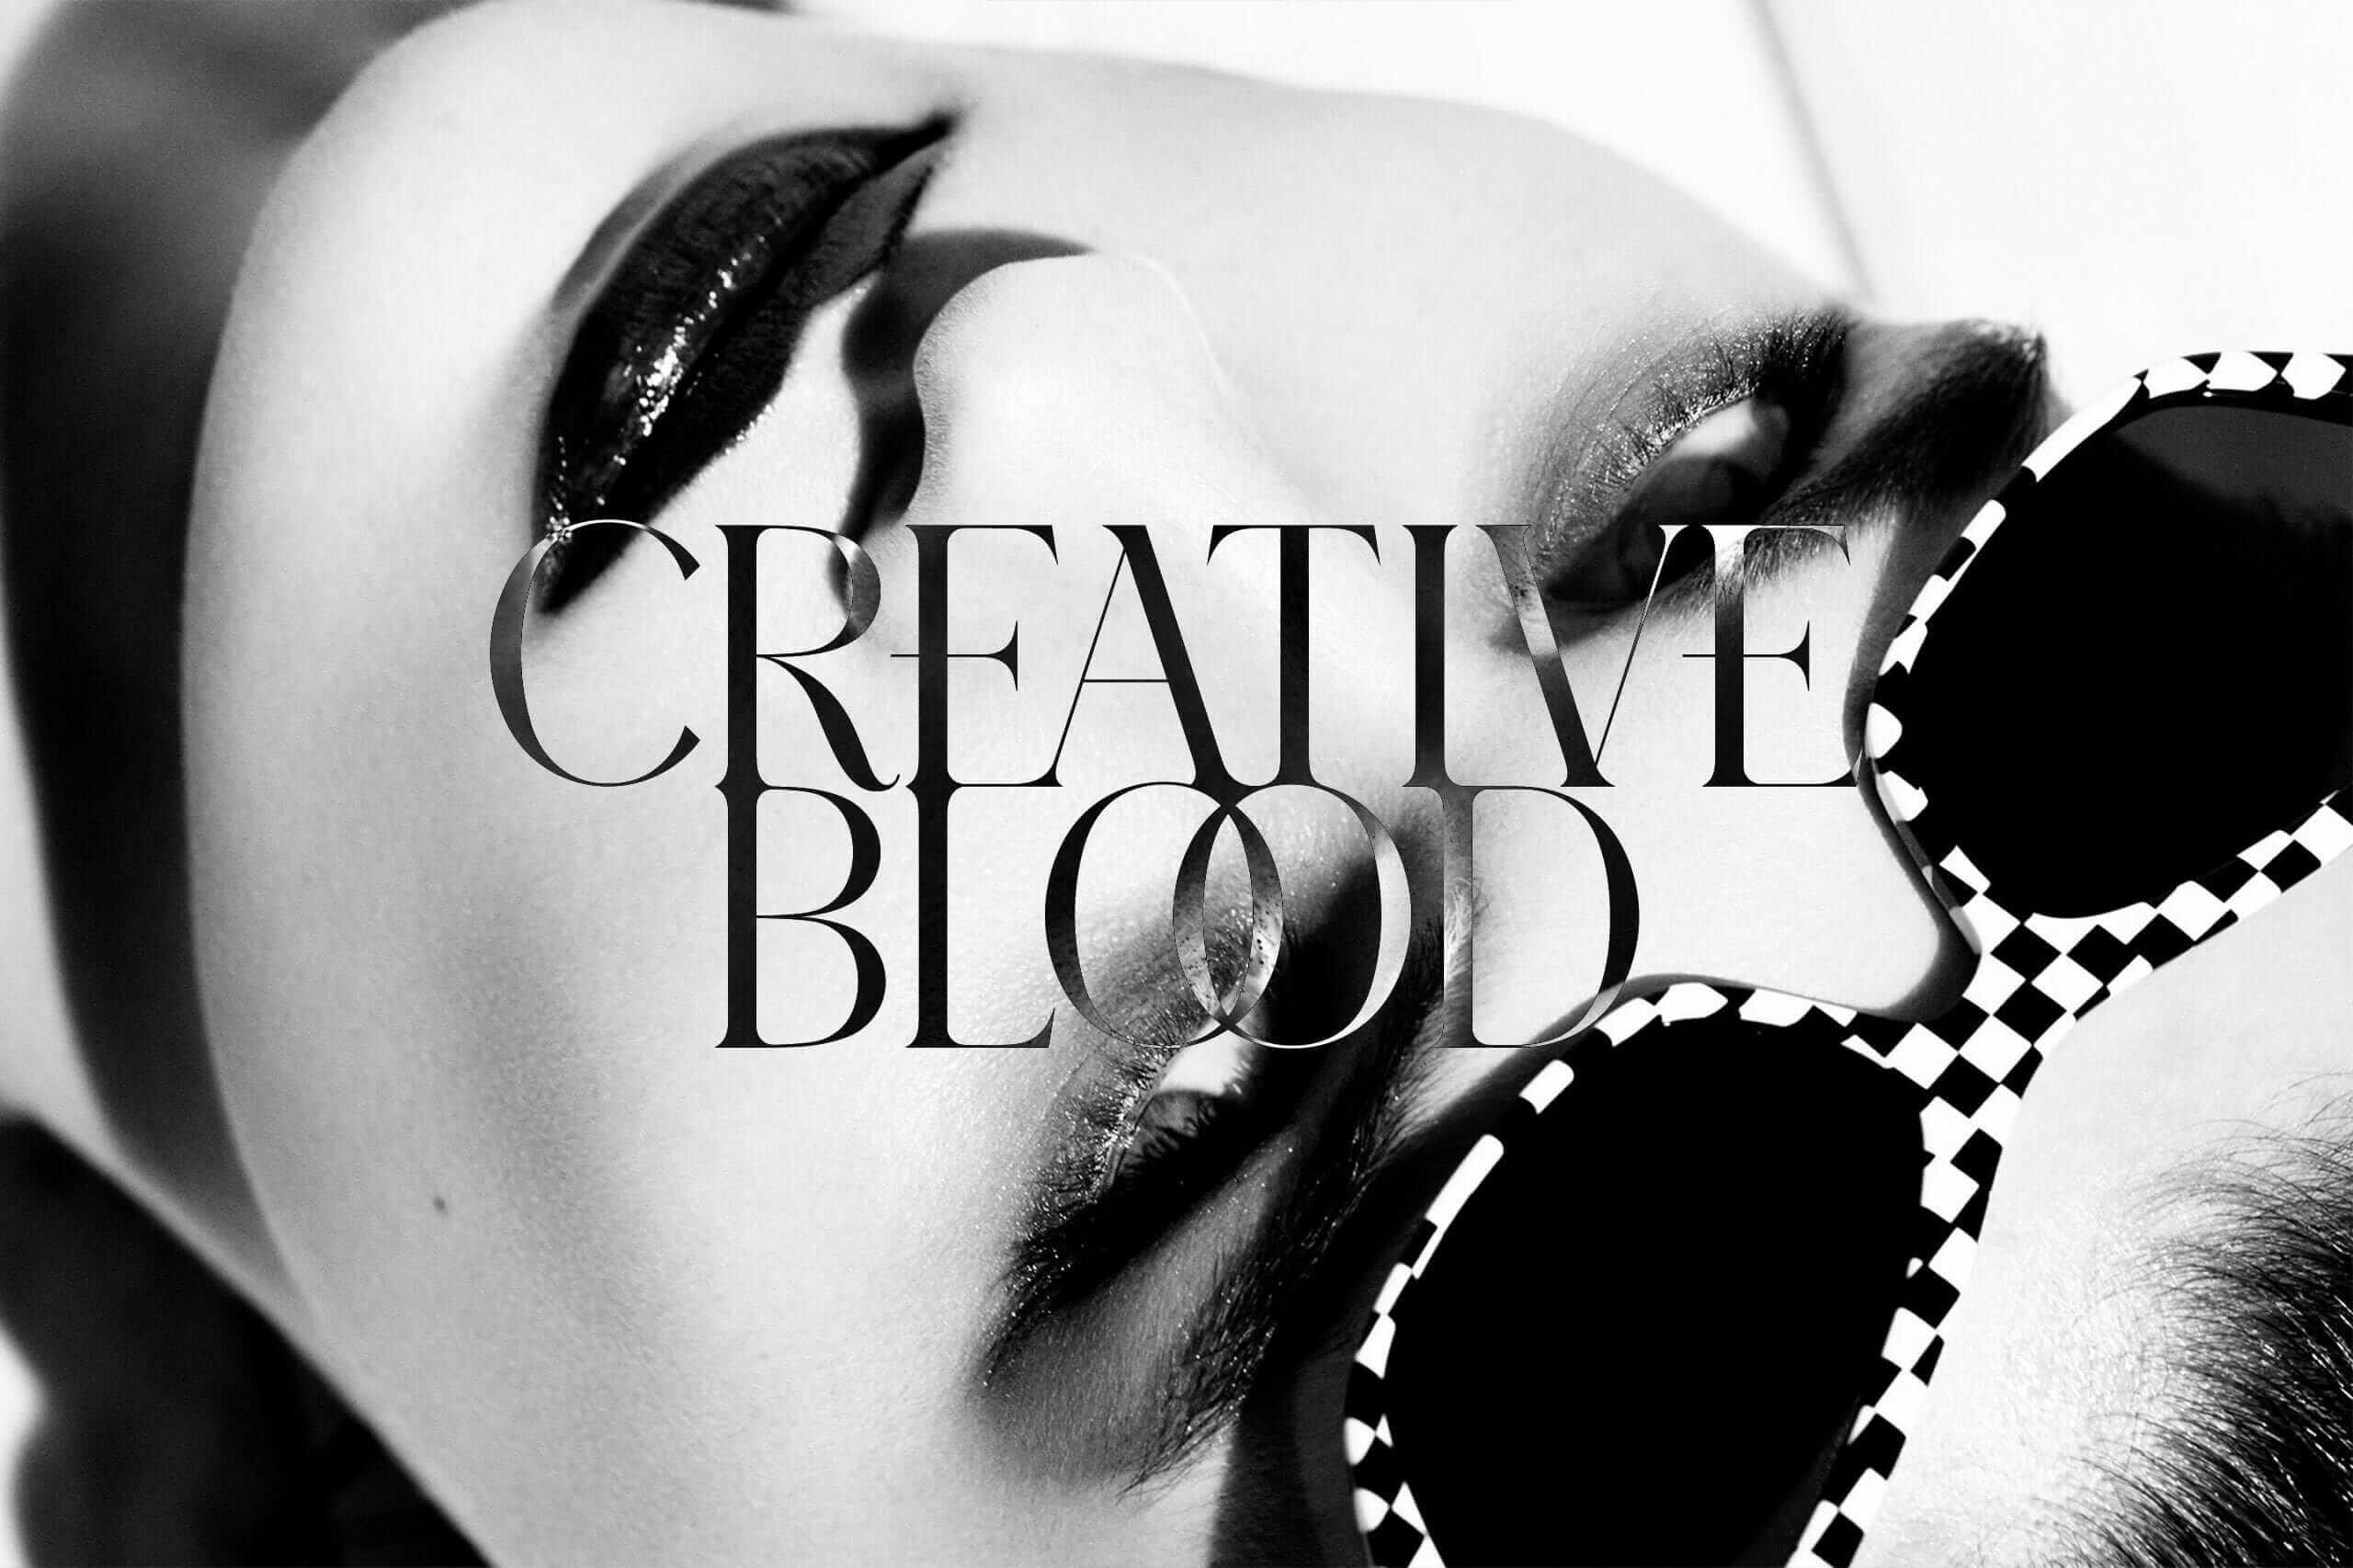 Creative Blood